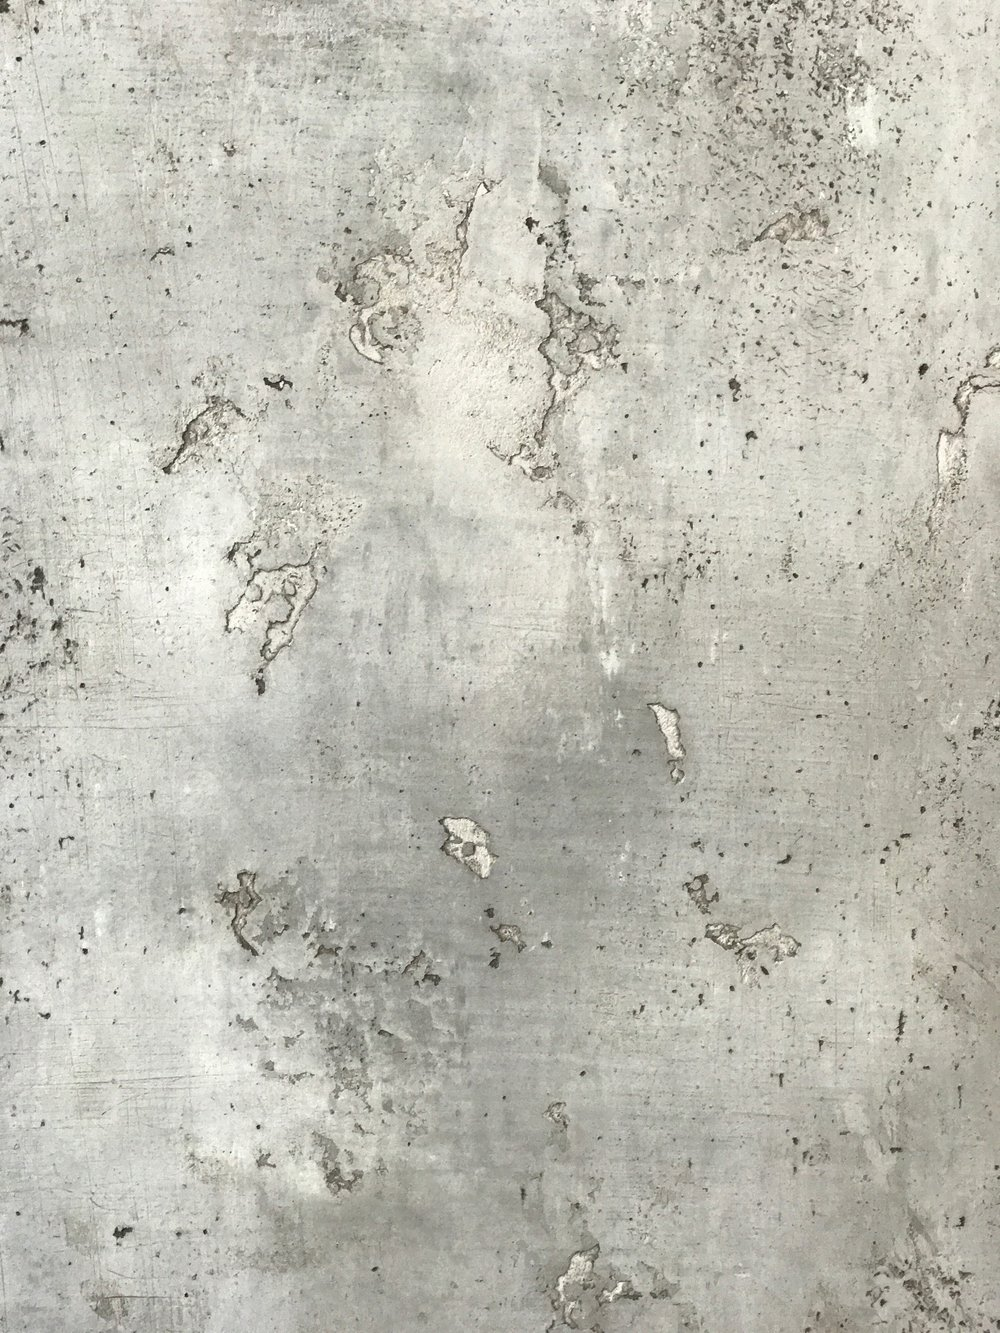 FirmoLux Piattp - Concrete Finish